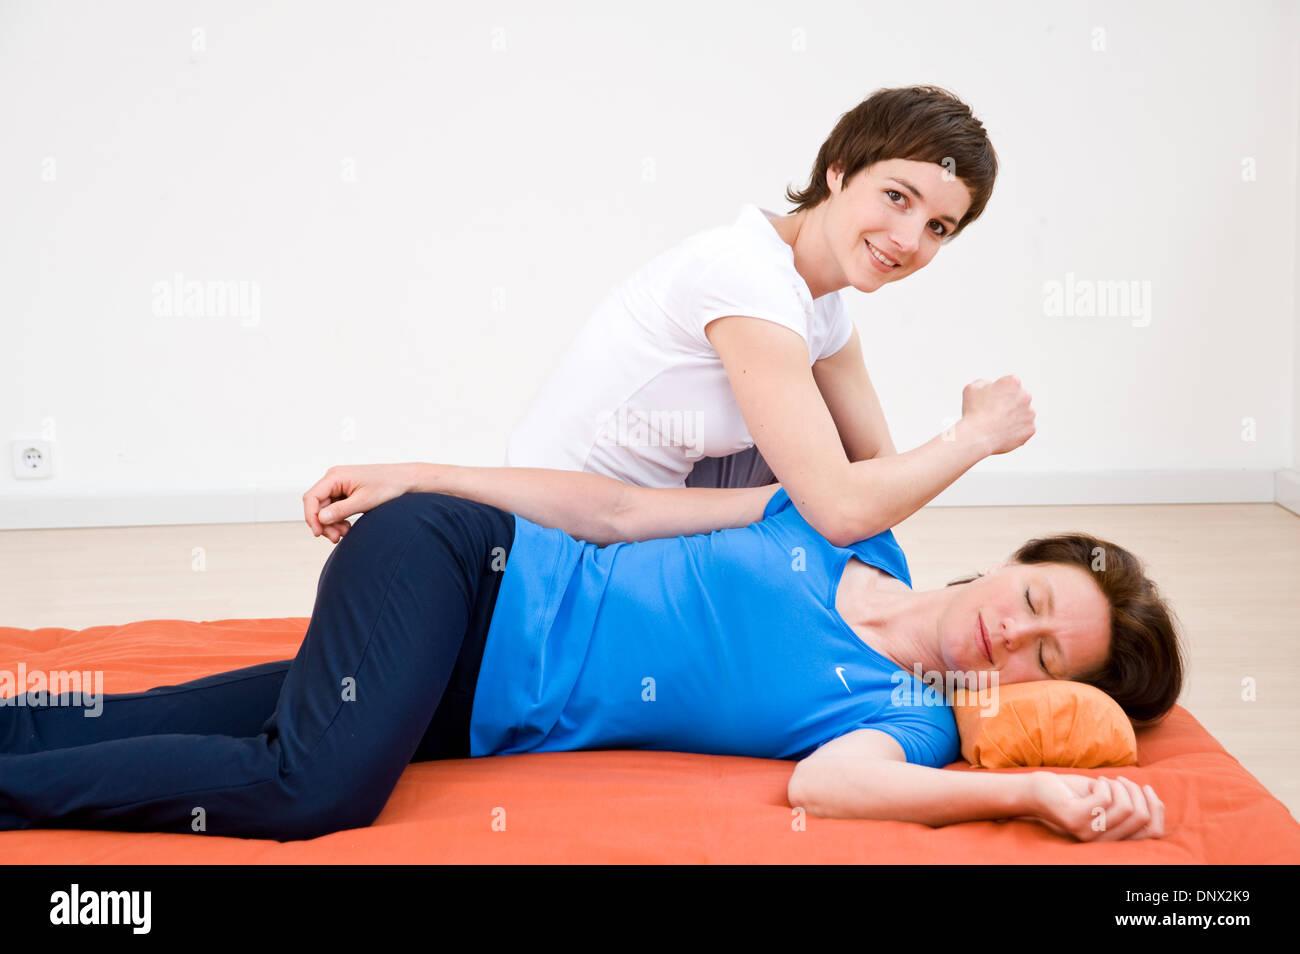 Hara Shiatsu Alternative Health Consciousness Treatment